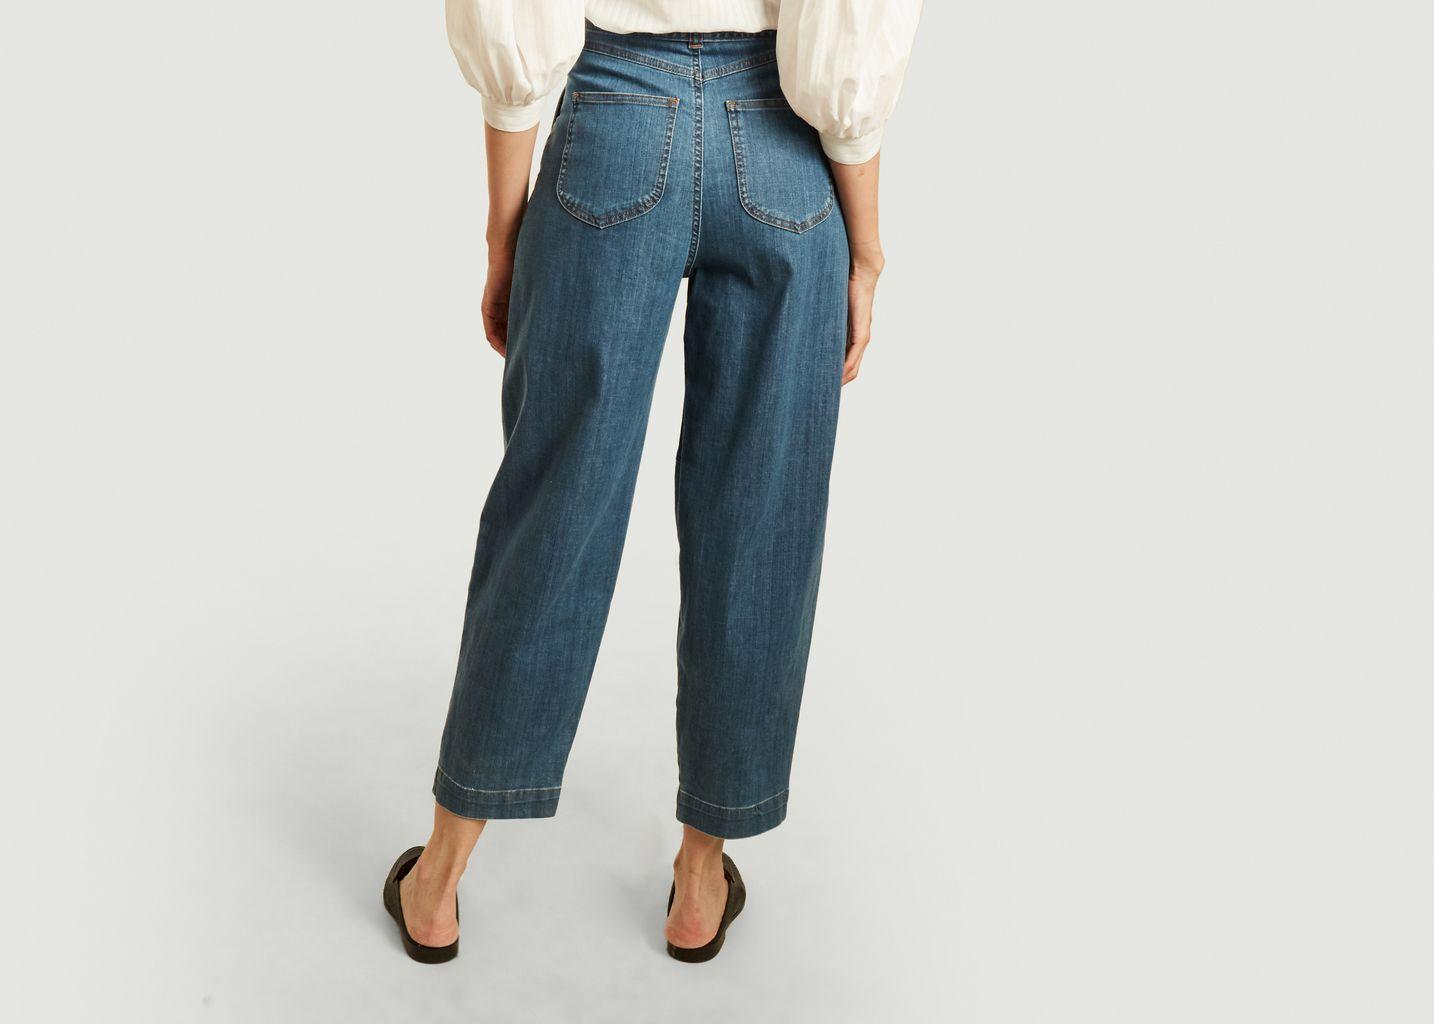 Pantalon ceinturé denim - See by Chloé